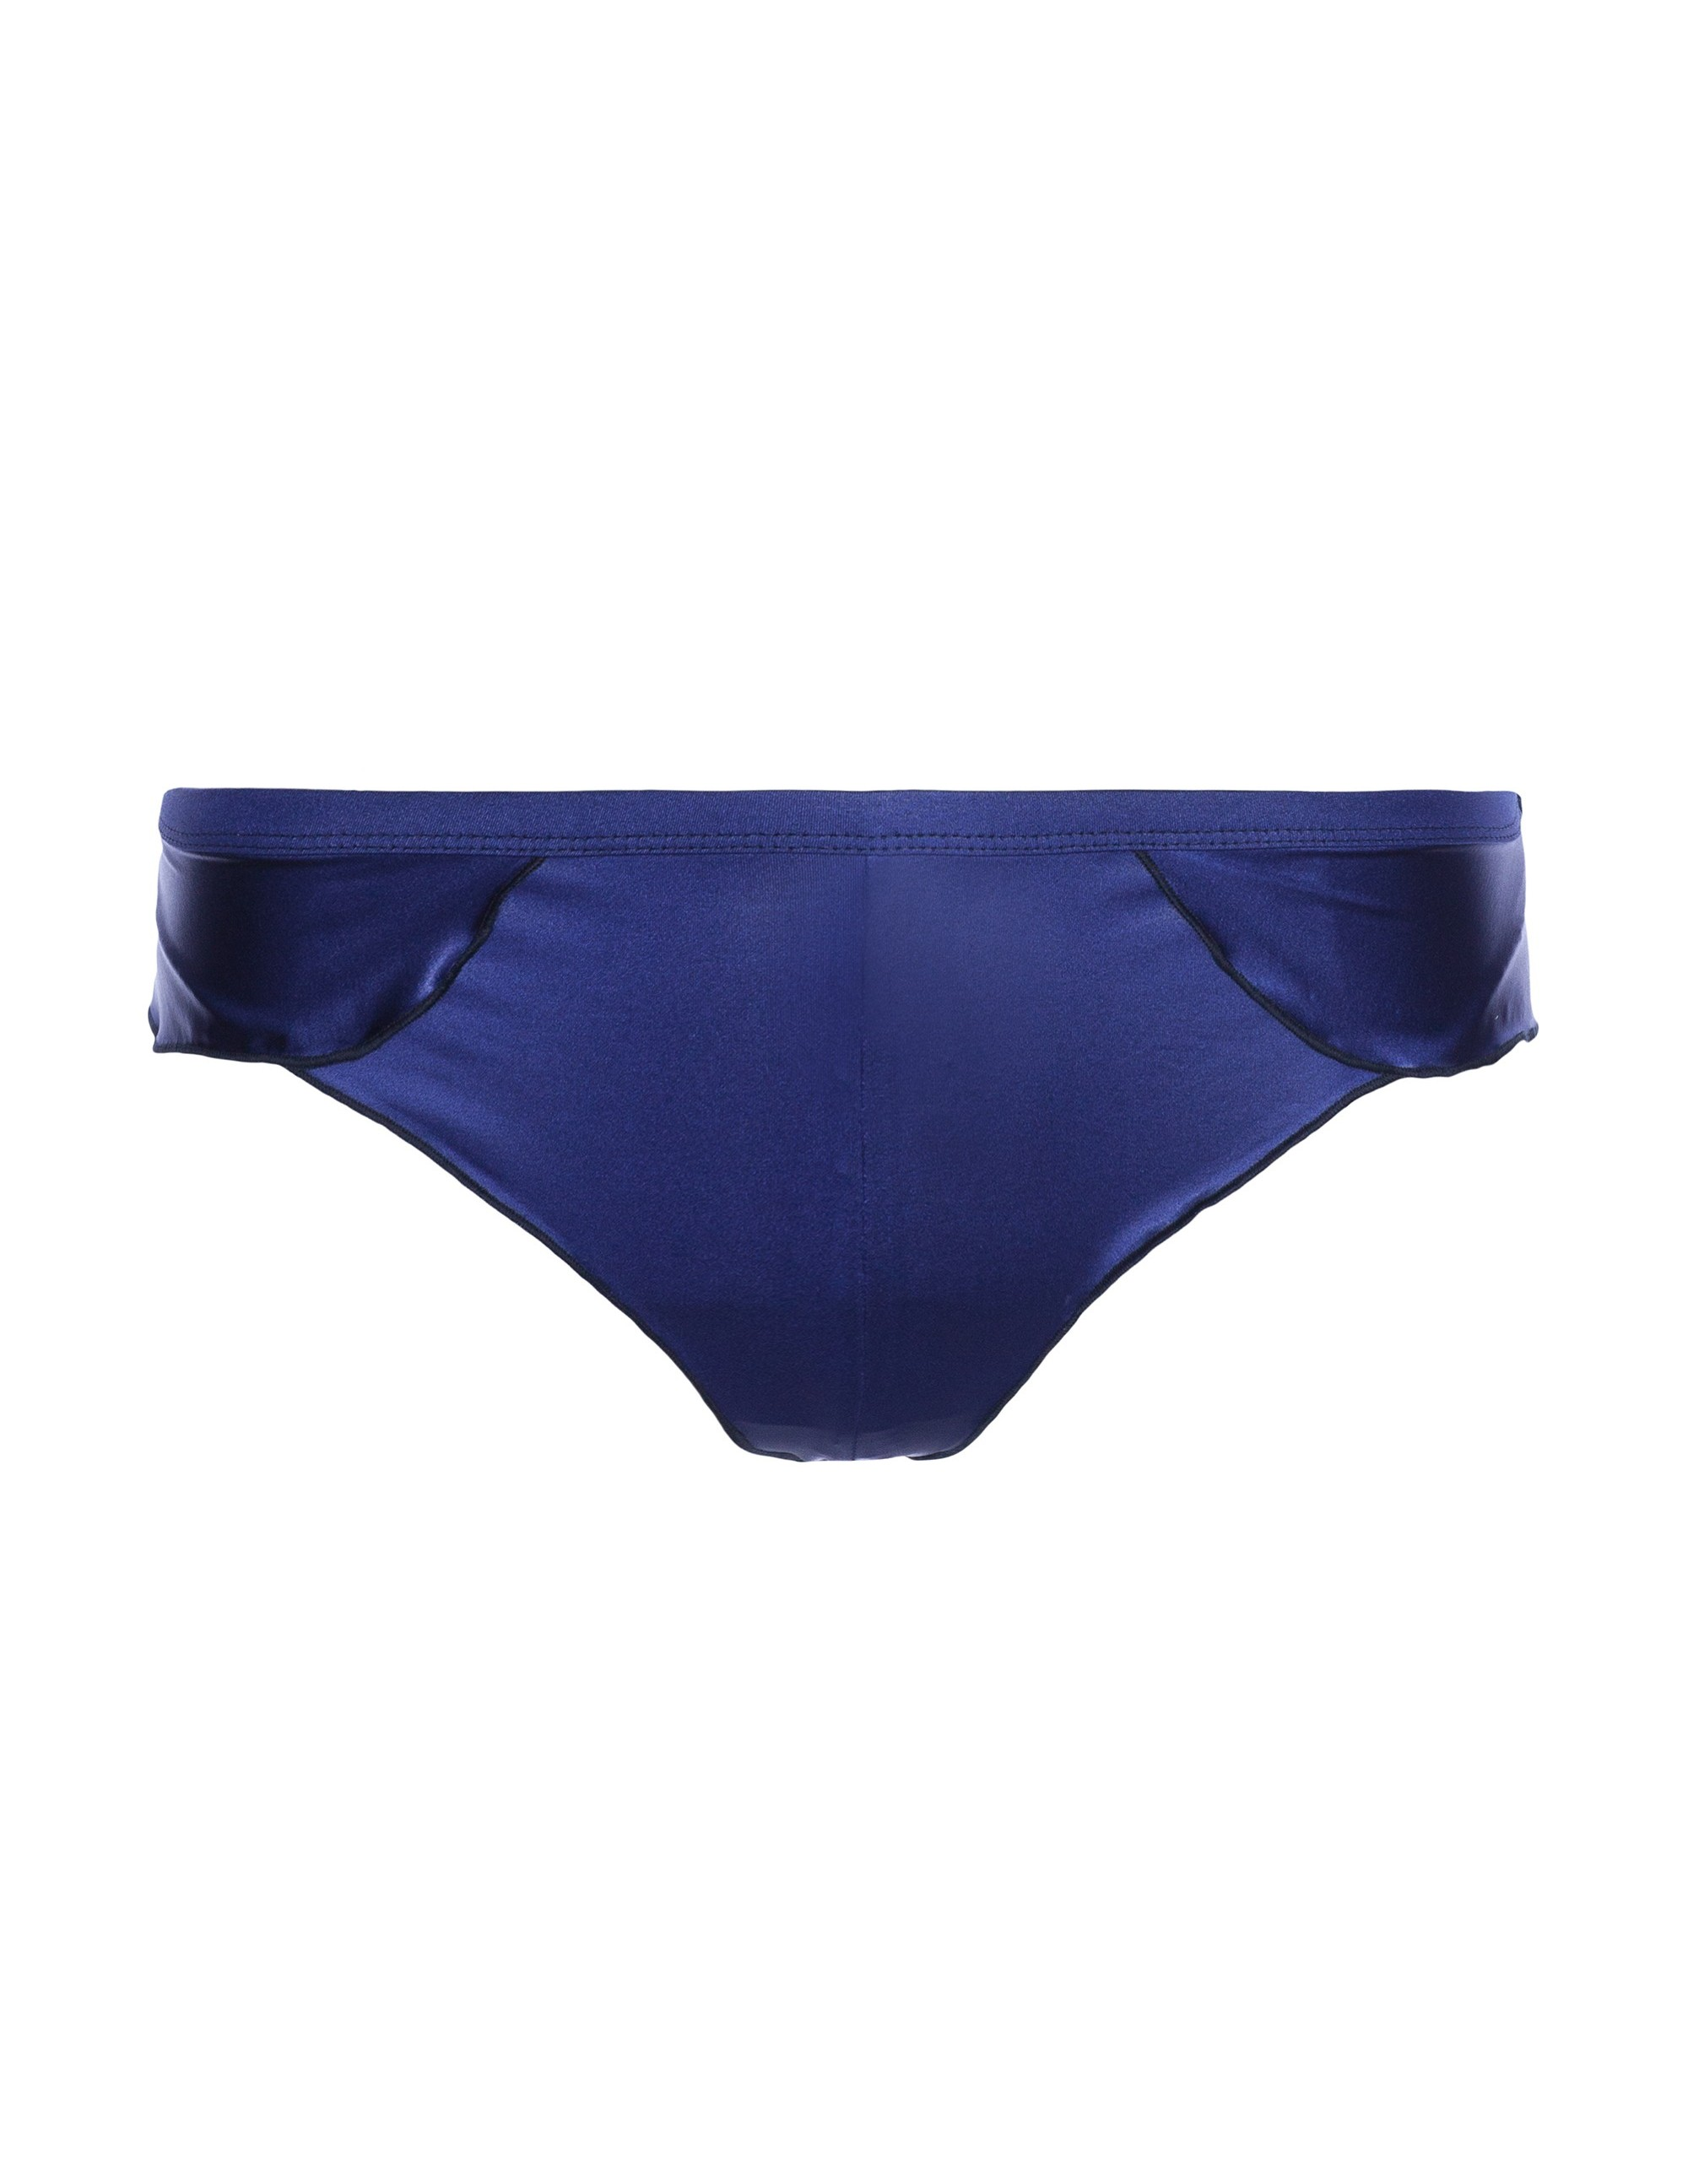 ROSE Lingerie set - SHINY BLUE